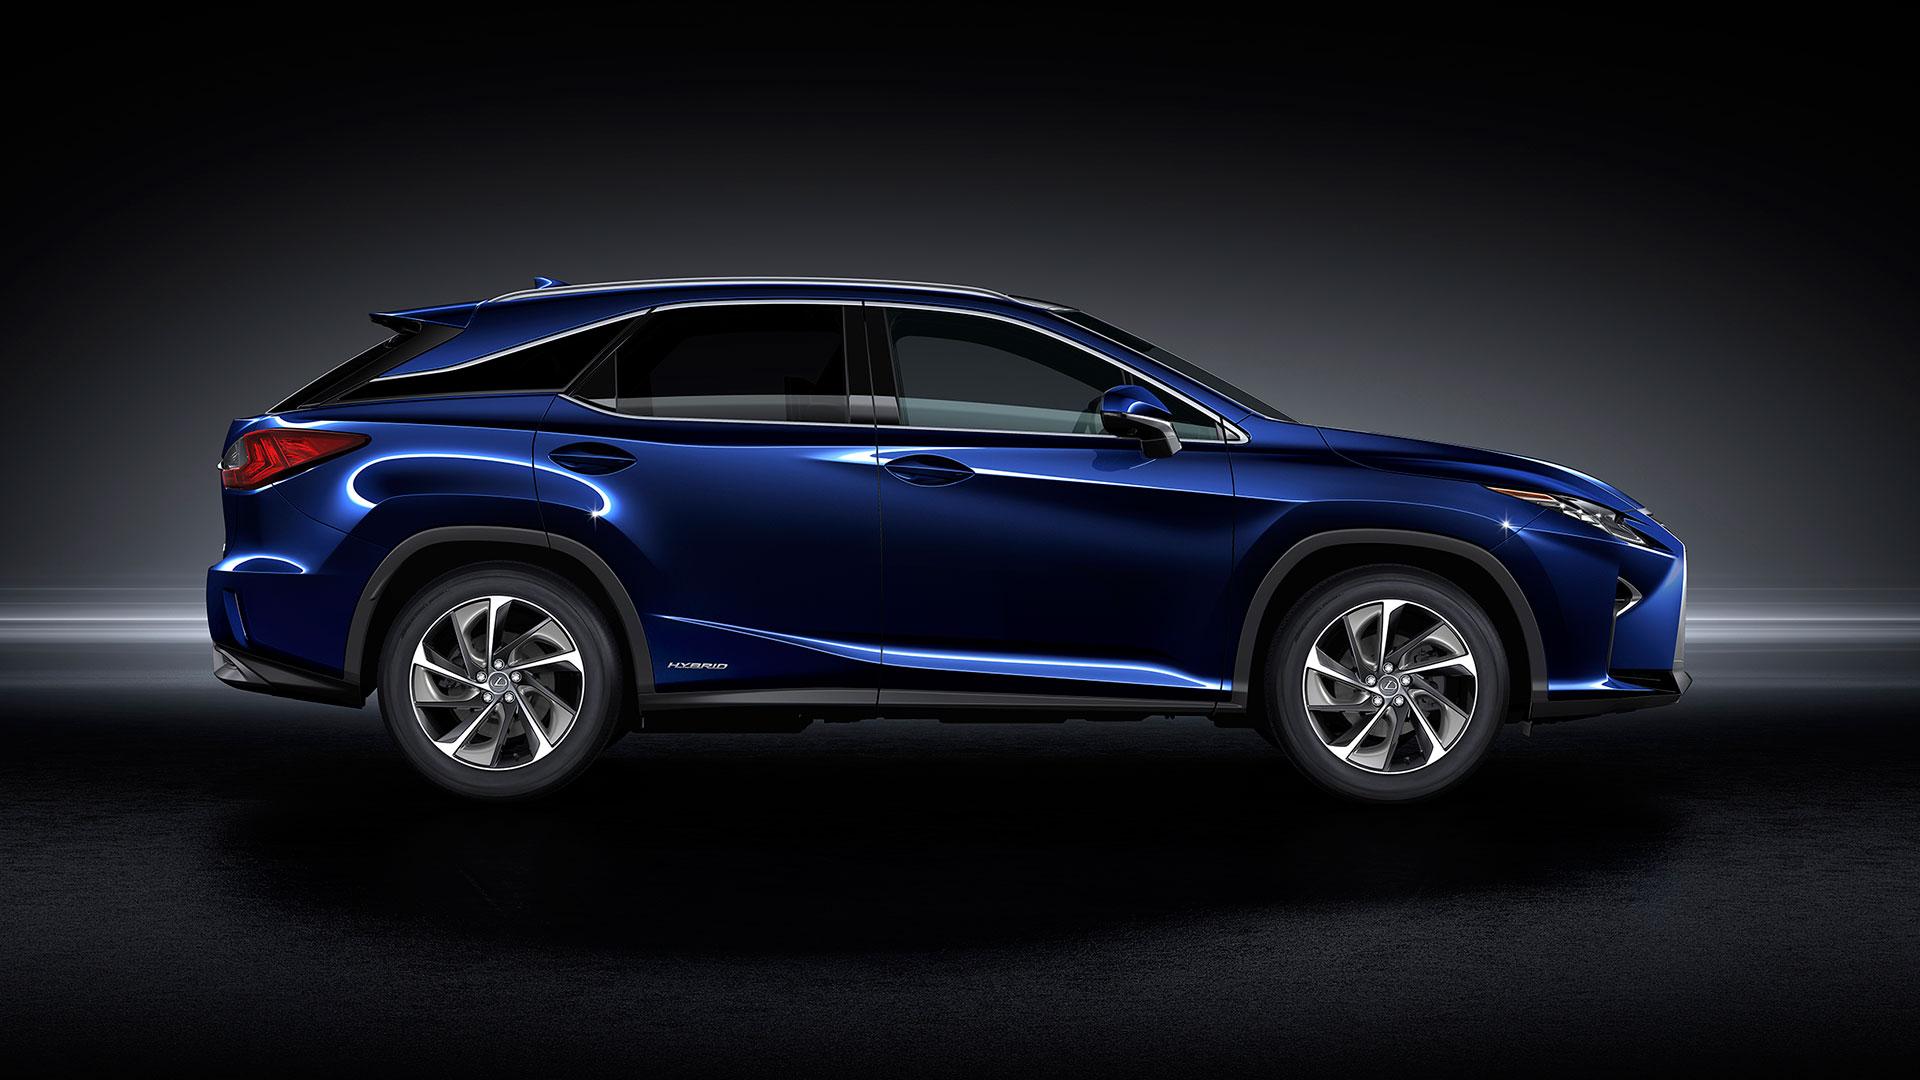 Nuevo RX 450h 2015 hero asset